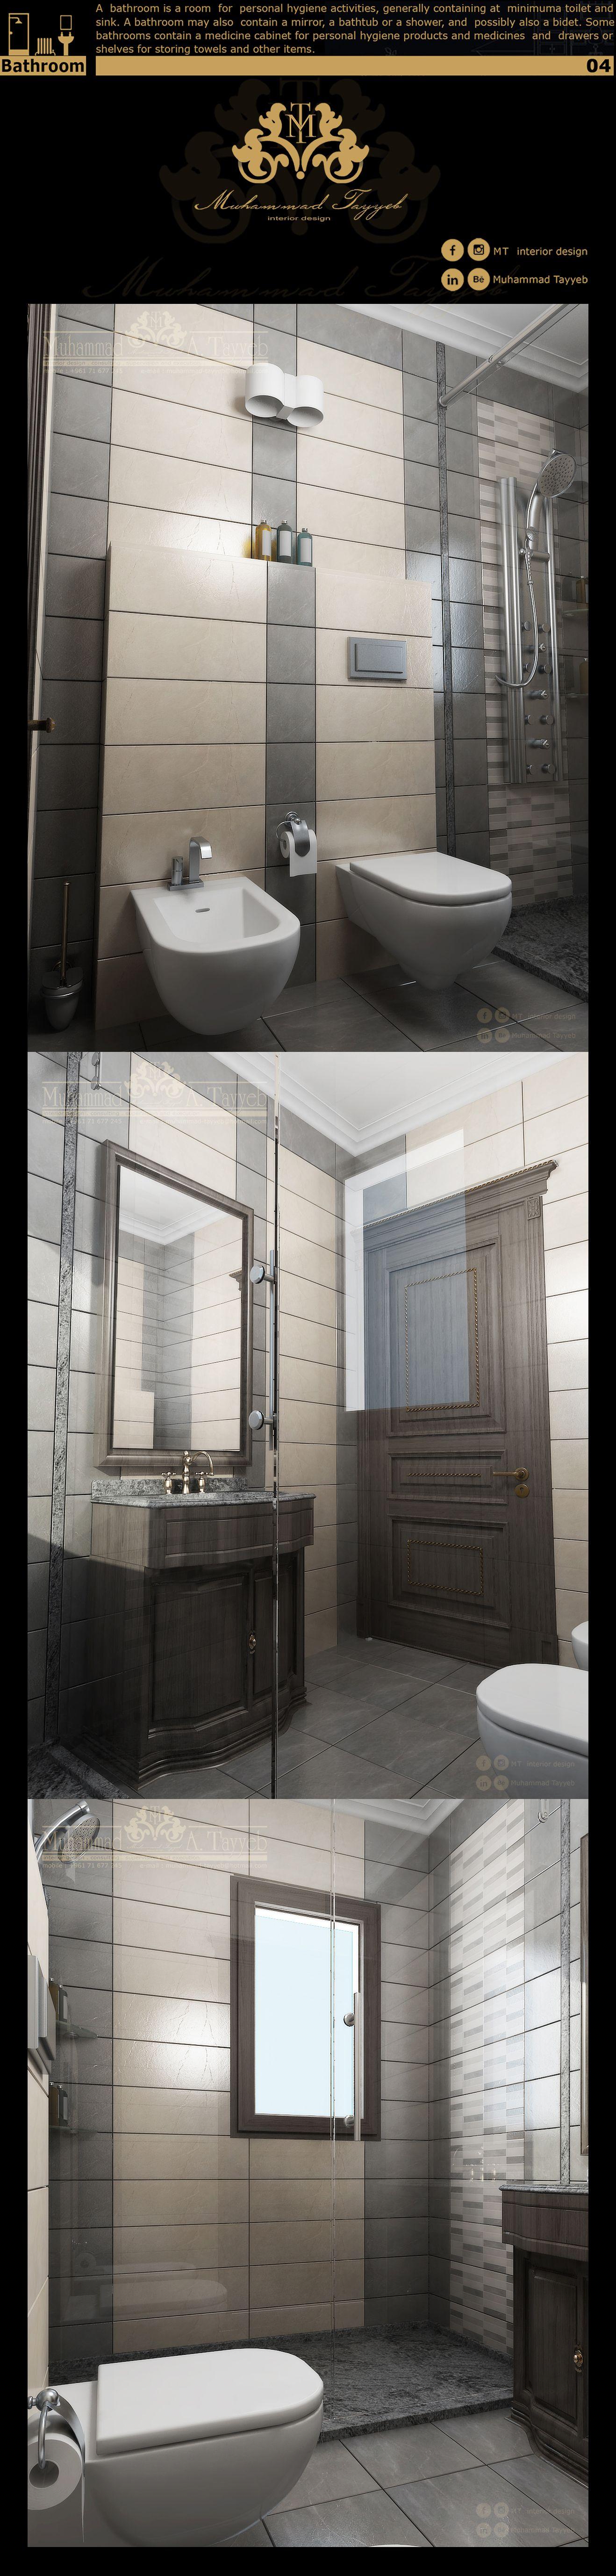 Simple But Cool Bathroom Ideas In 2020 Amazing Bathrooms Modern Bathroom Cool Stuff